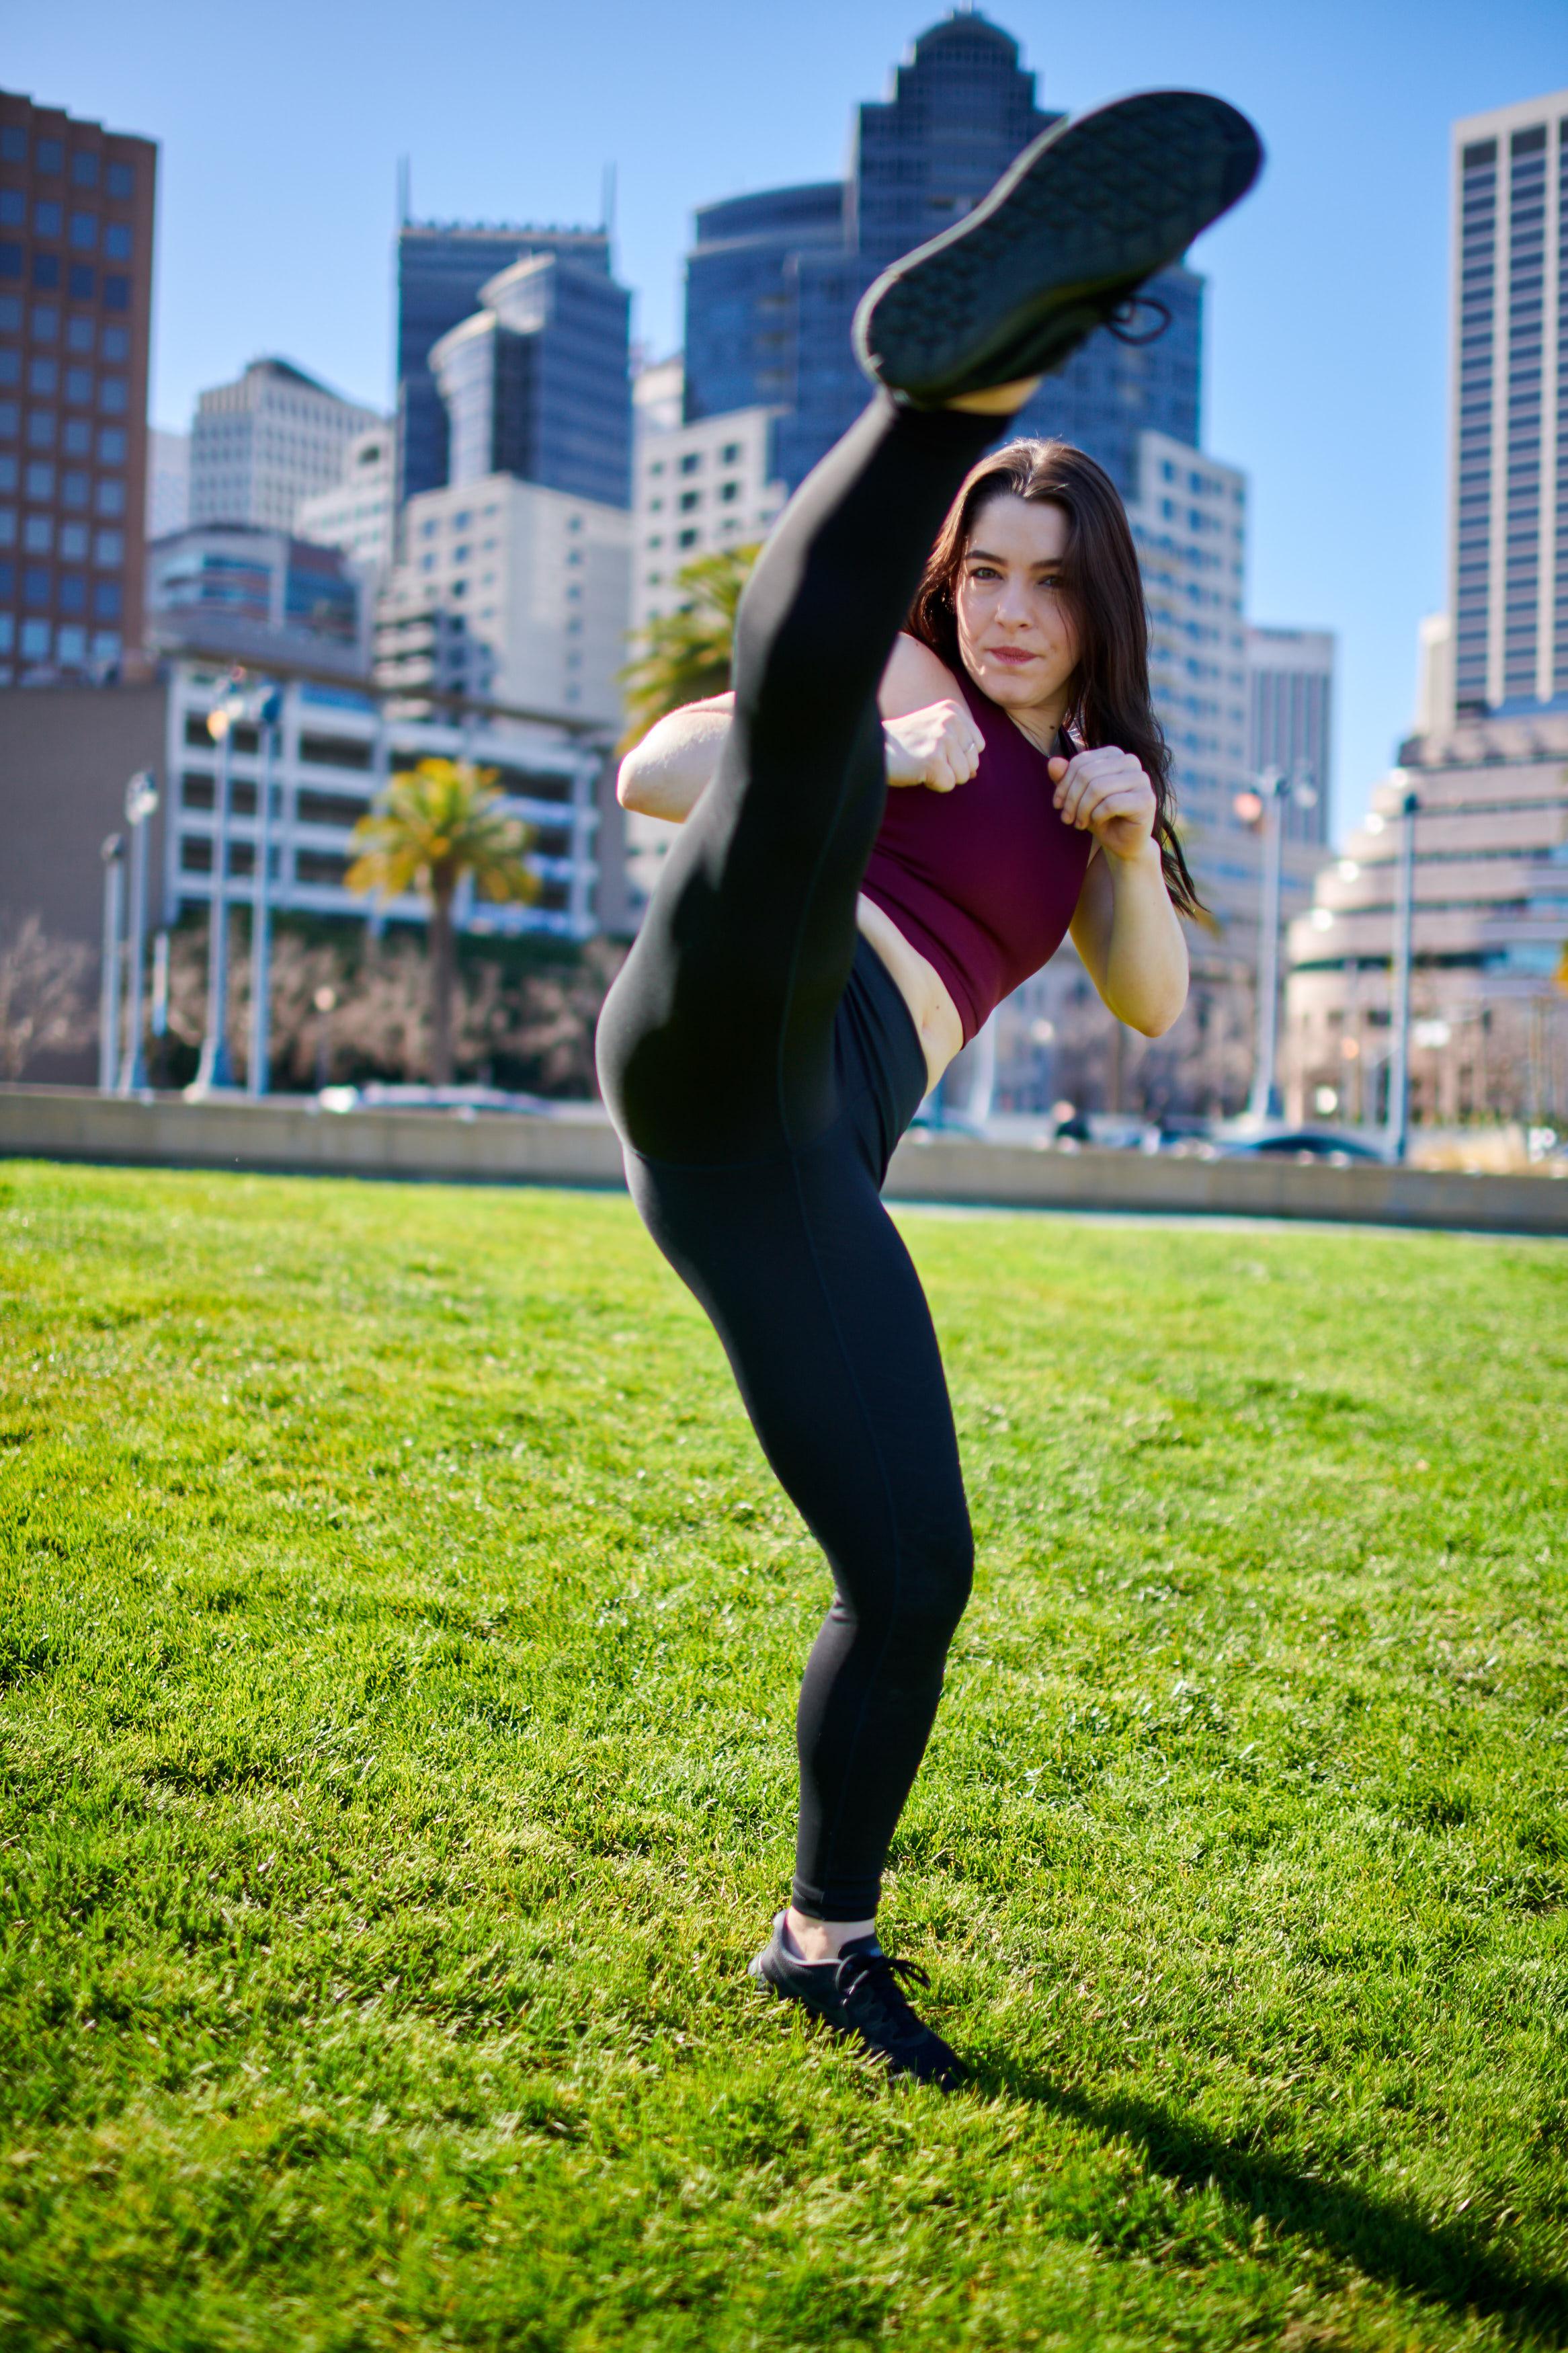 angela-fitness-profile-06.jpg